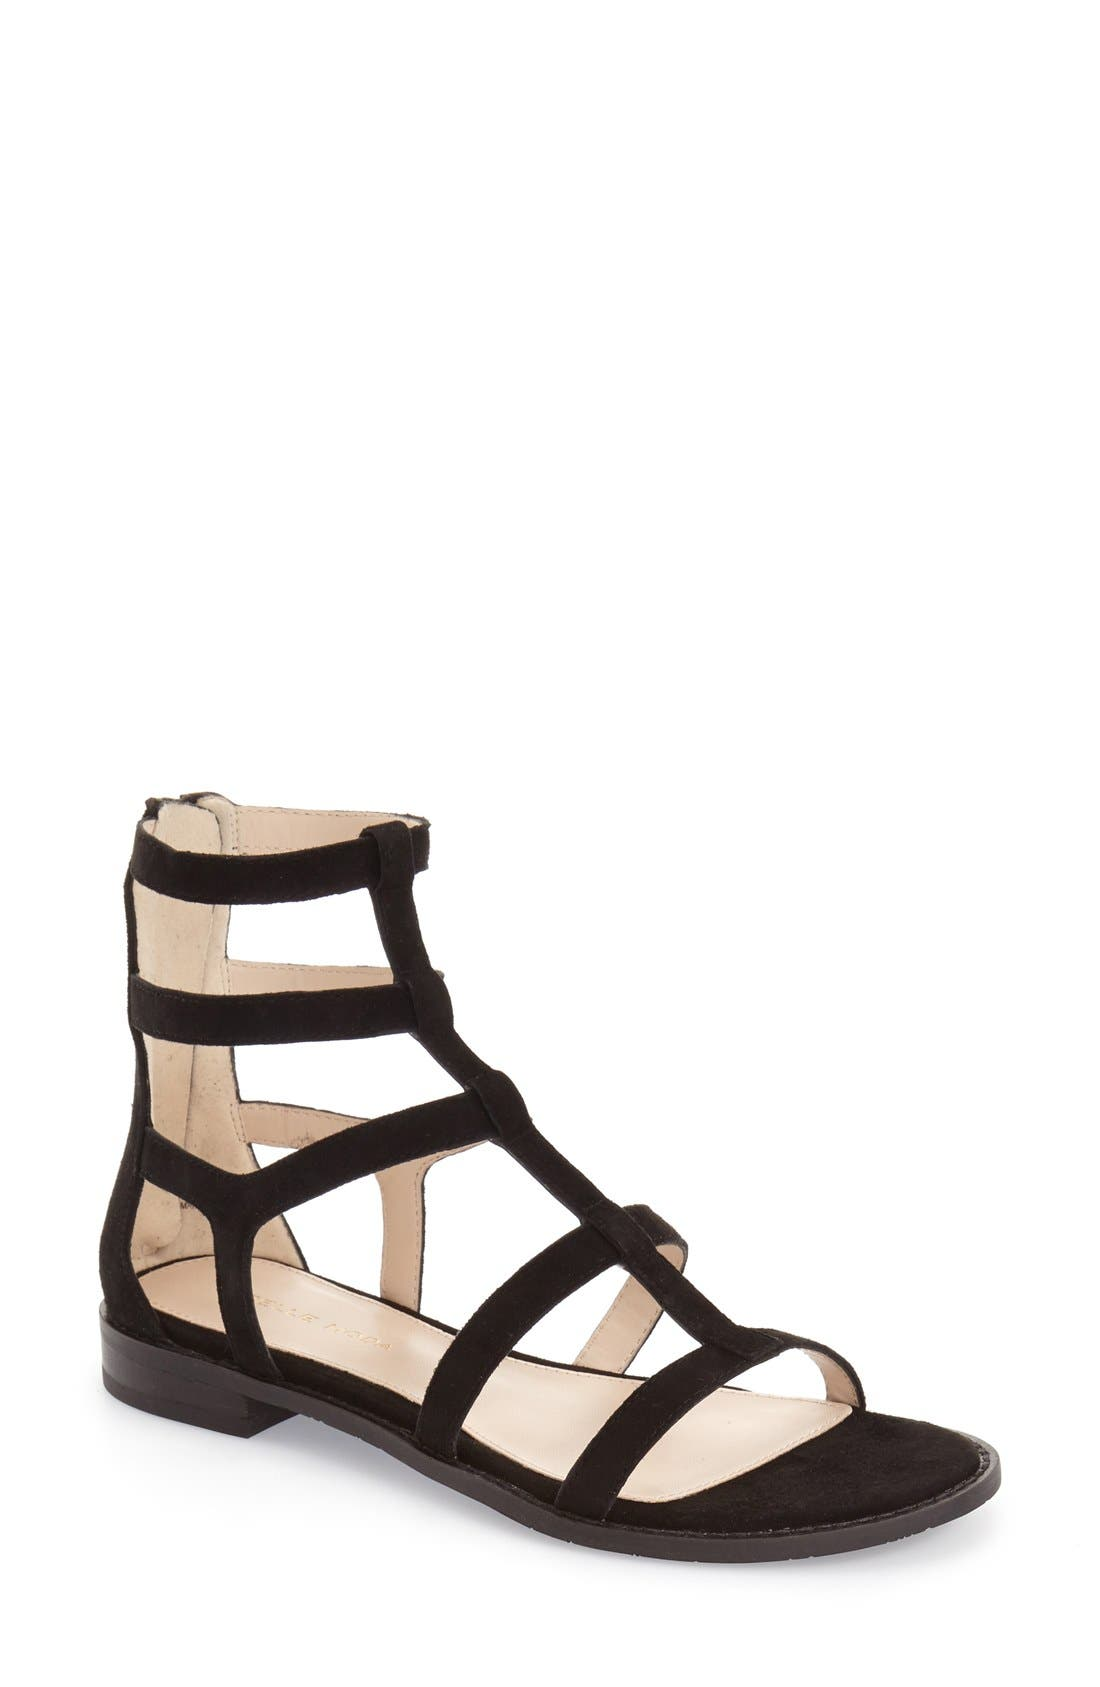 'Helen' Flat Gladiator Sandal,                             Main thumbnail 1, color,                             Black Leather